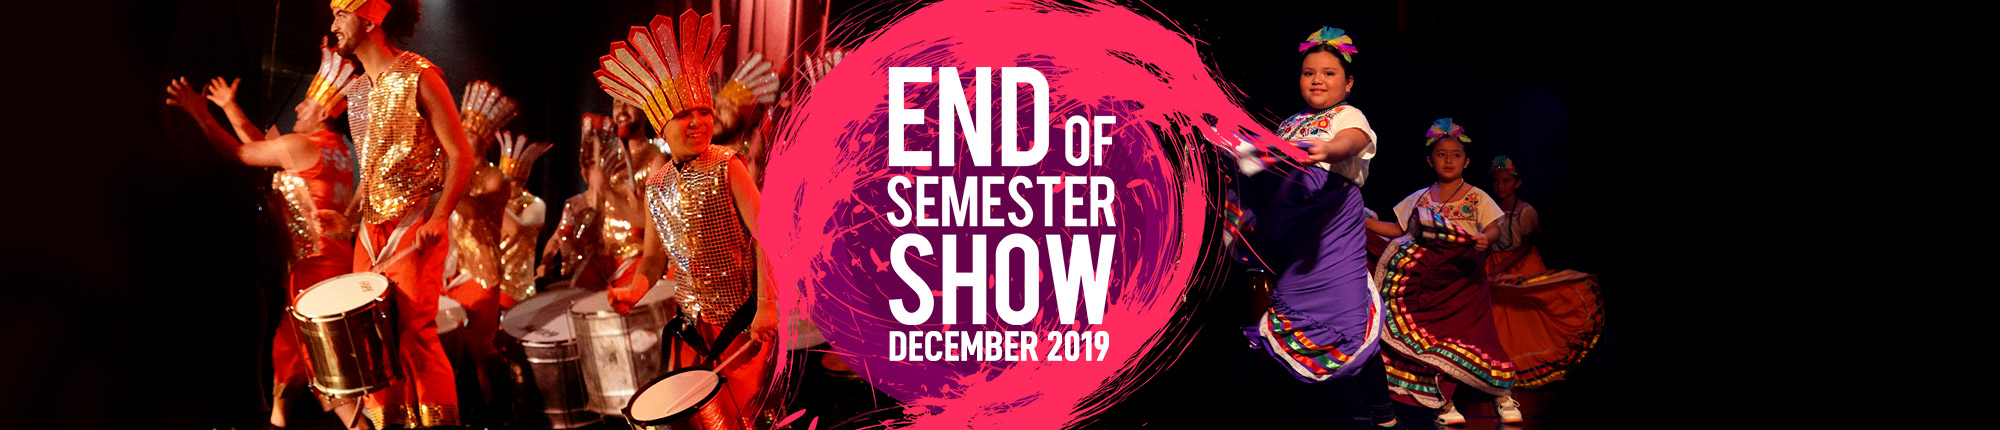 End Of Semester Show December 2019